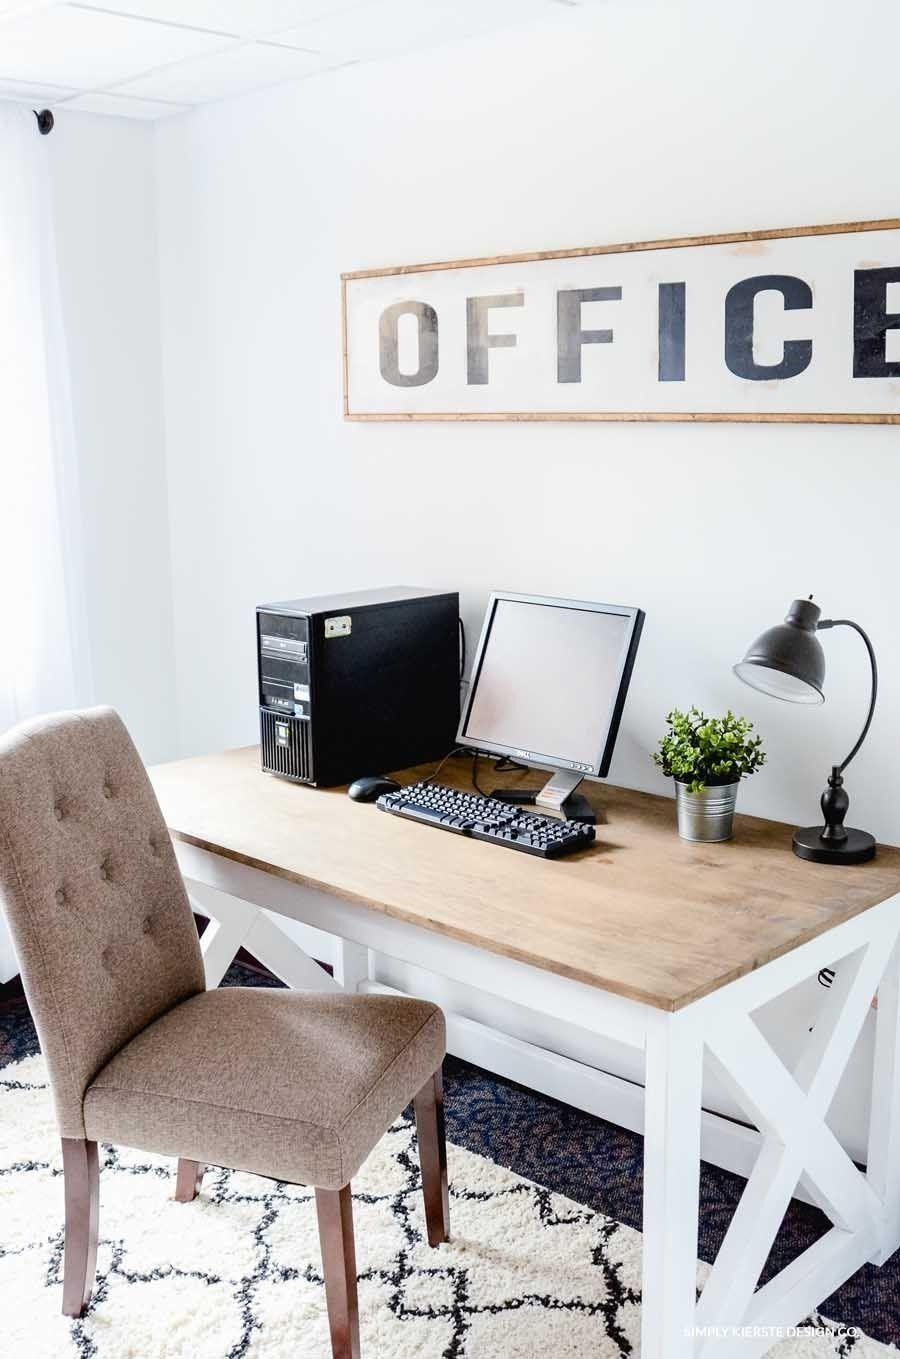 20 creative farmhouse desk ideas for the home office to